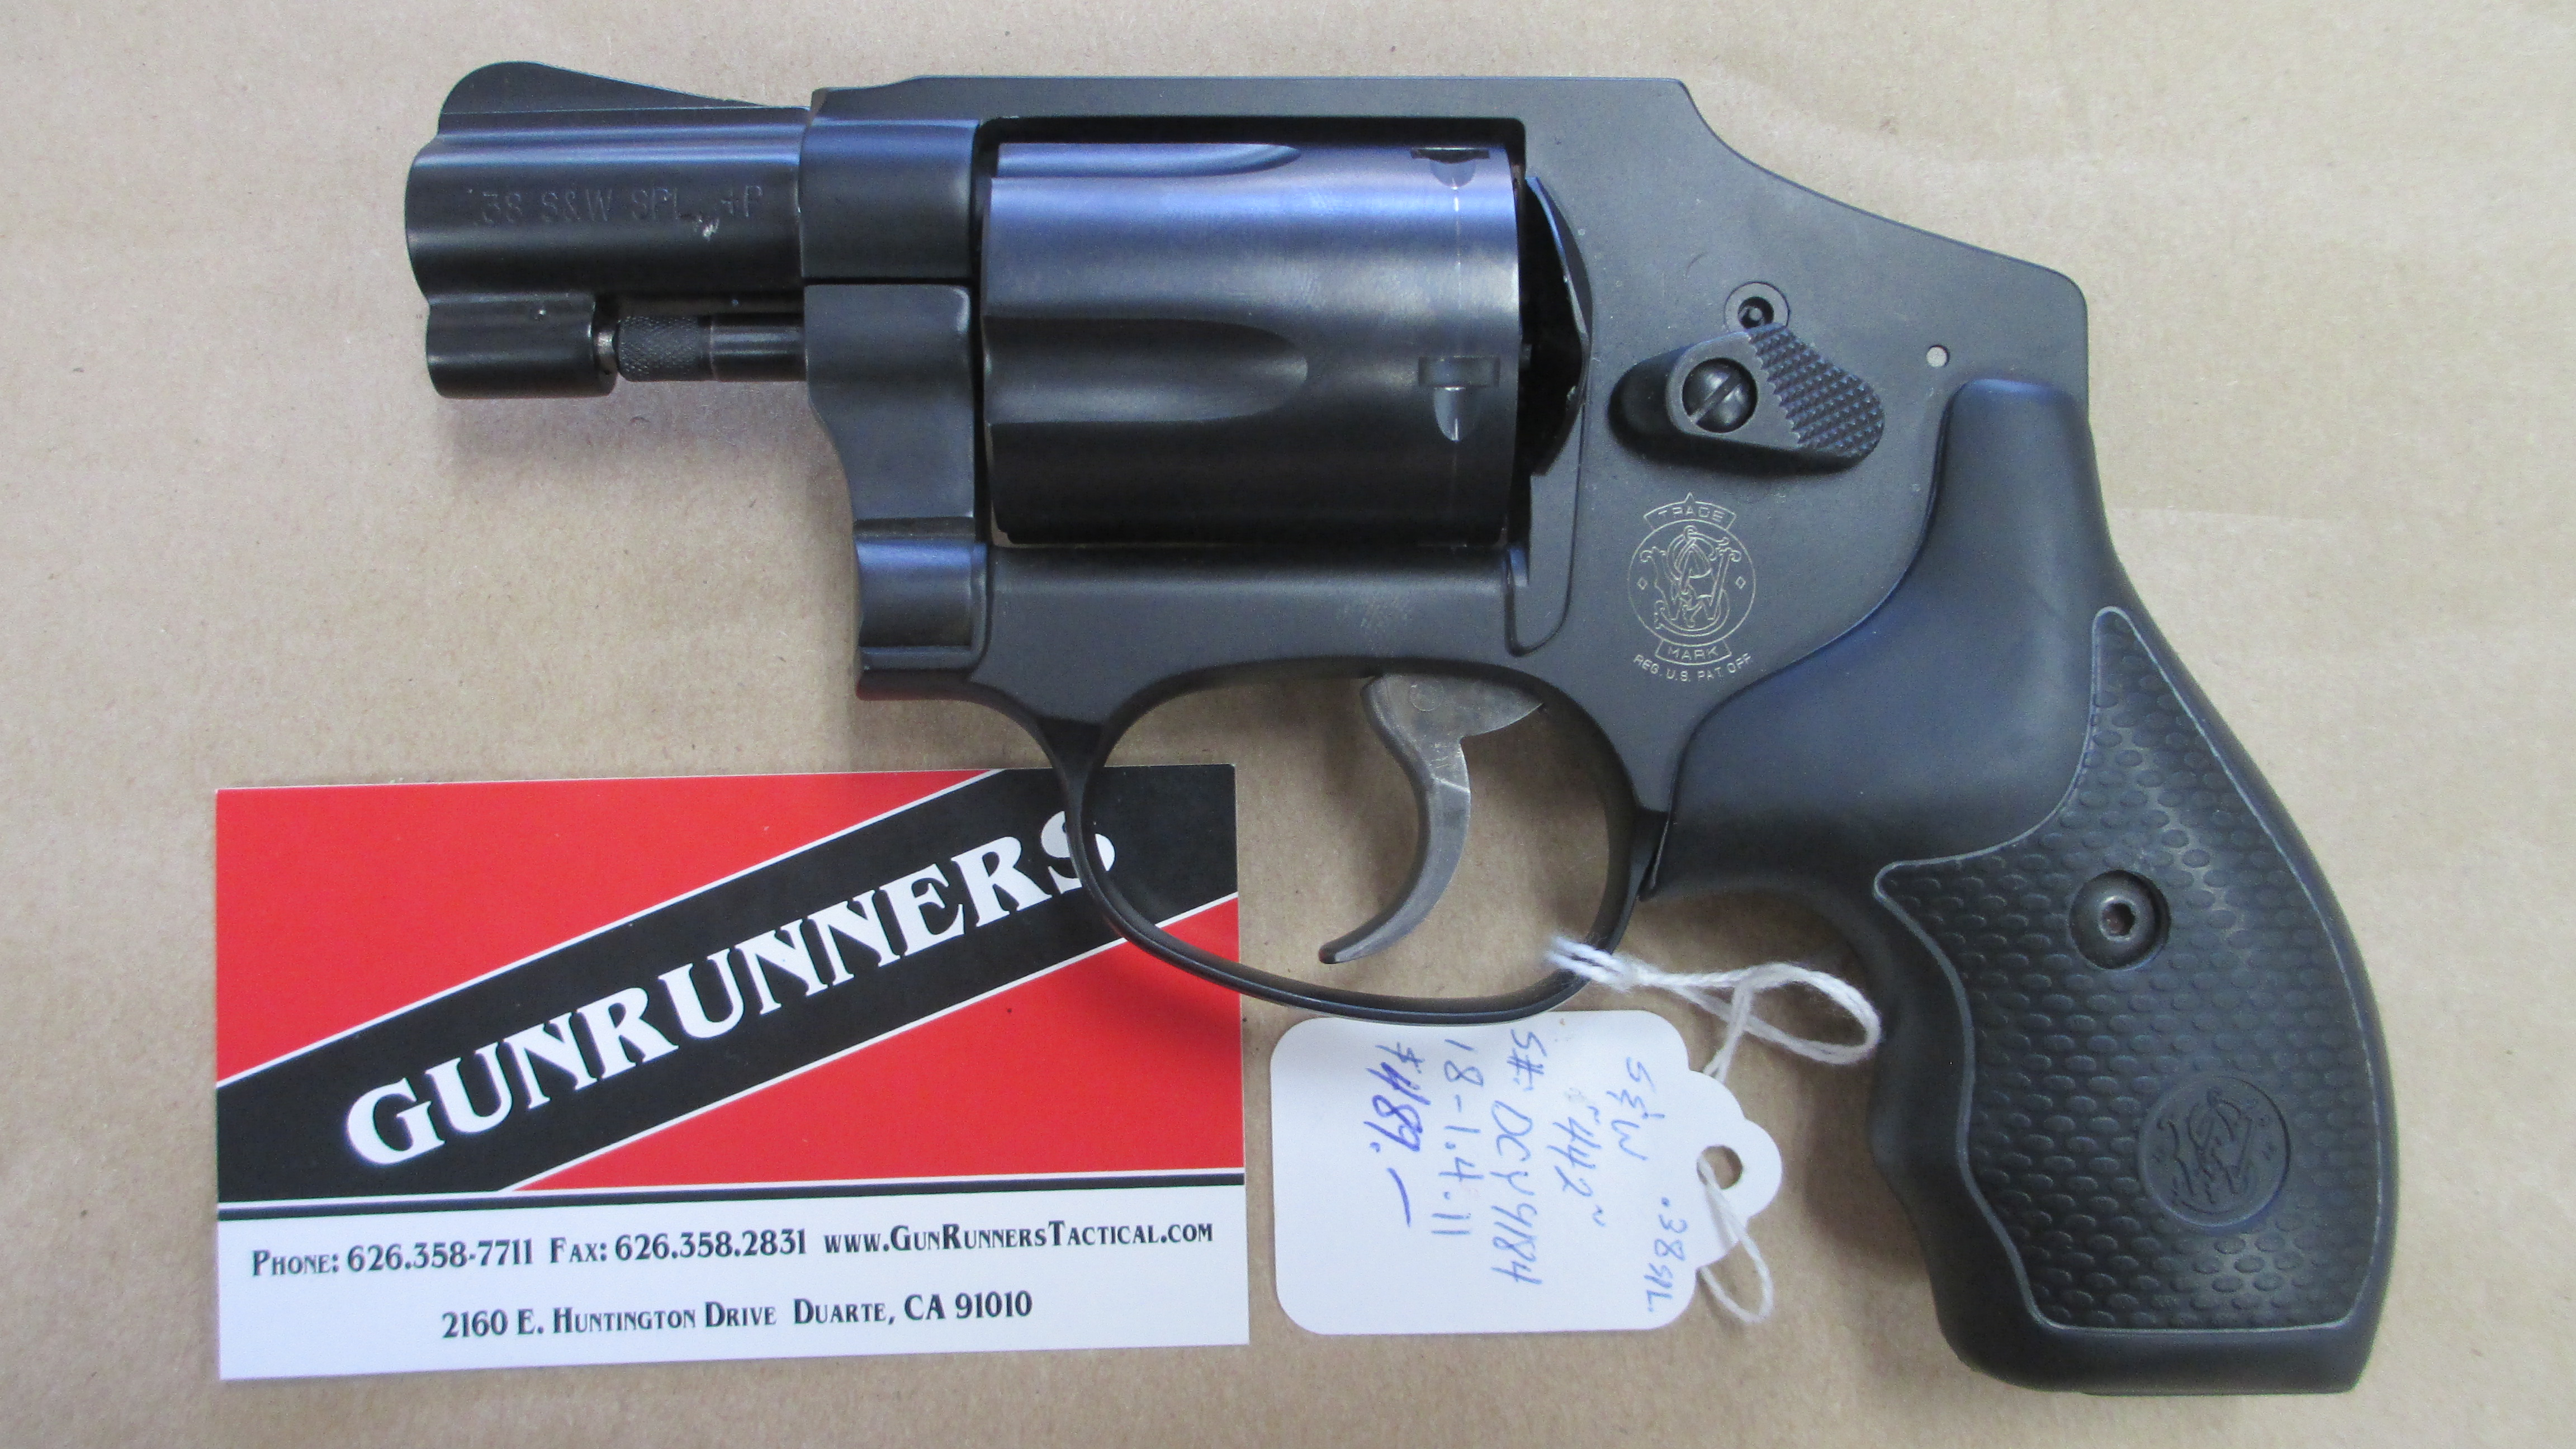 Gunrunnerstactical - Catalog - Revolvers